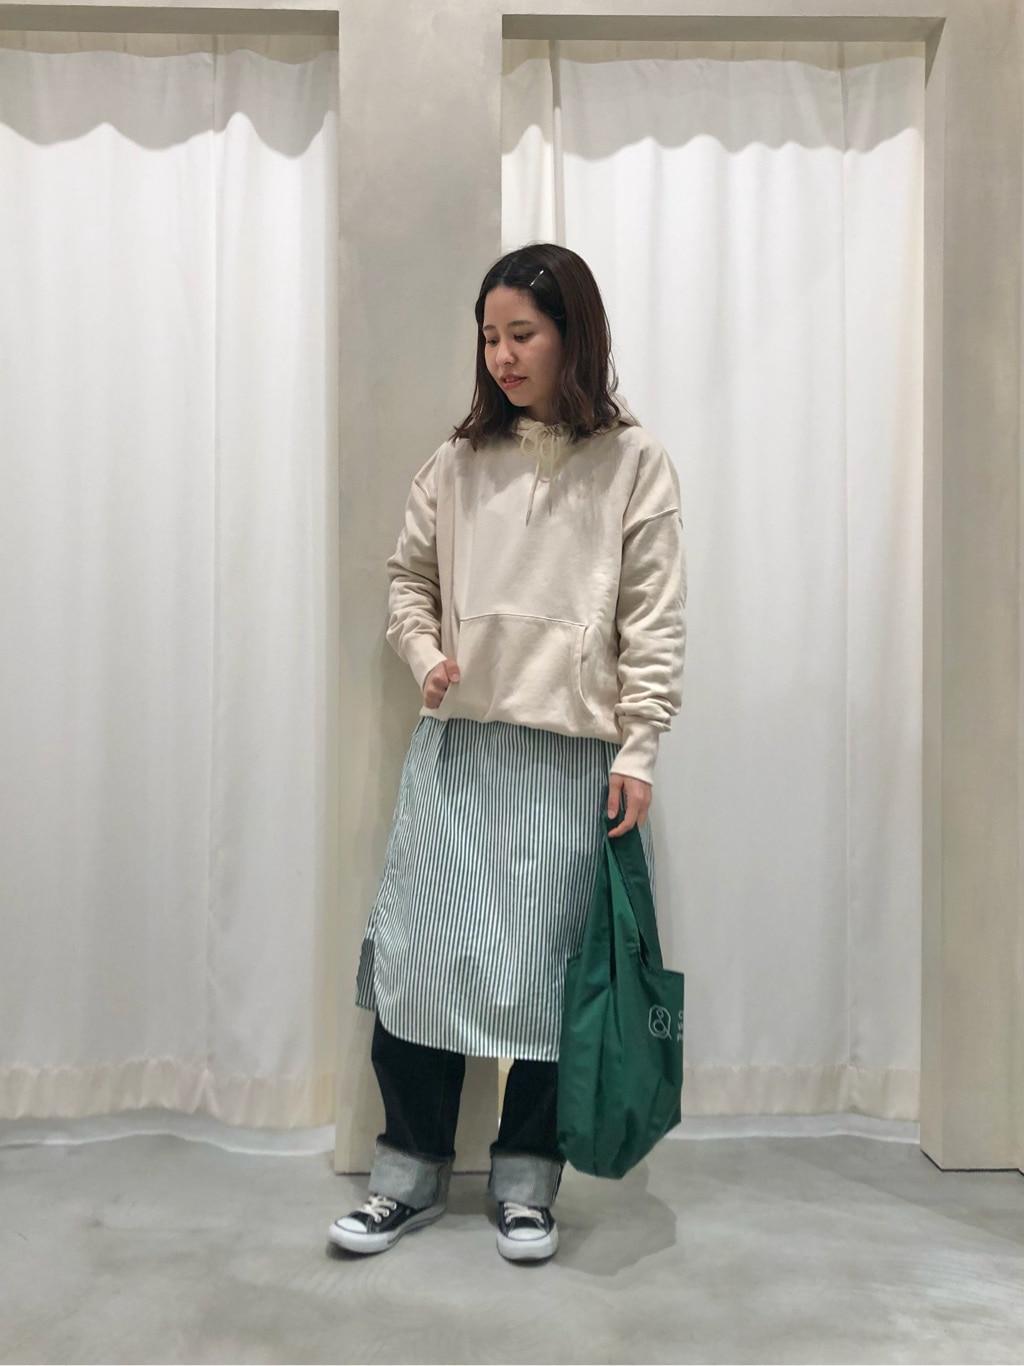 CHILD WOMAN , PAR ICI 東京スカイツリータウン・ソラマチ 2021.01.04